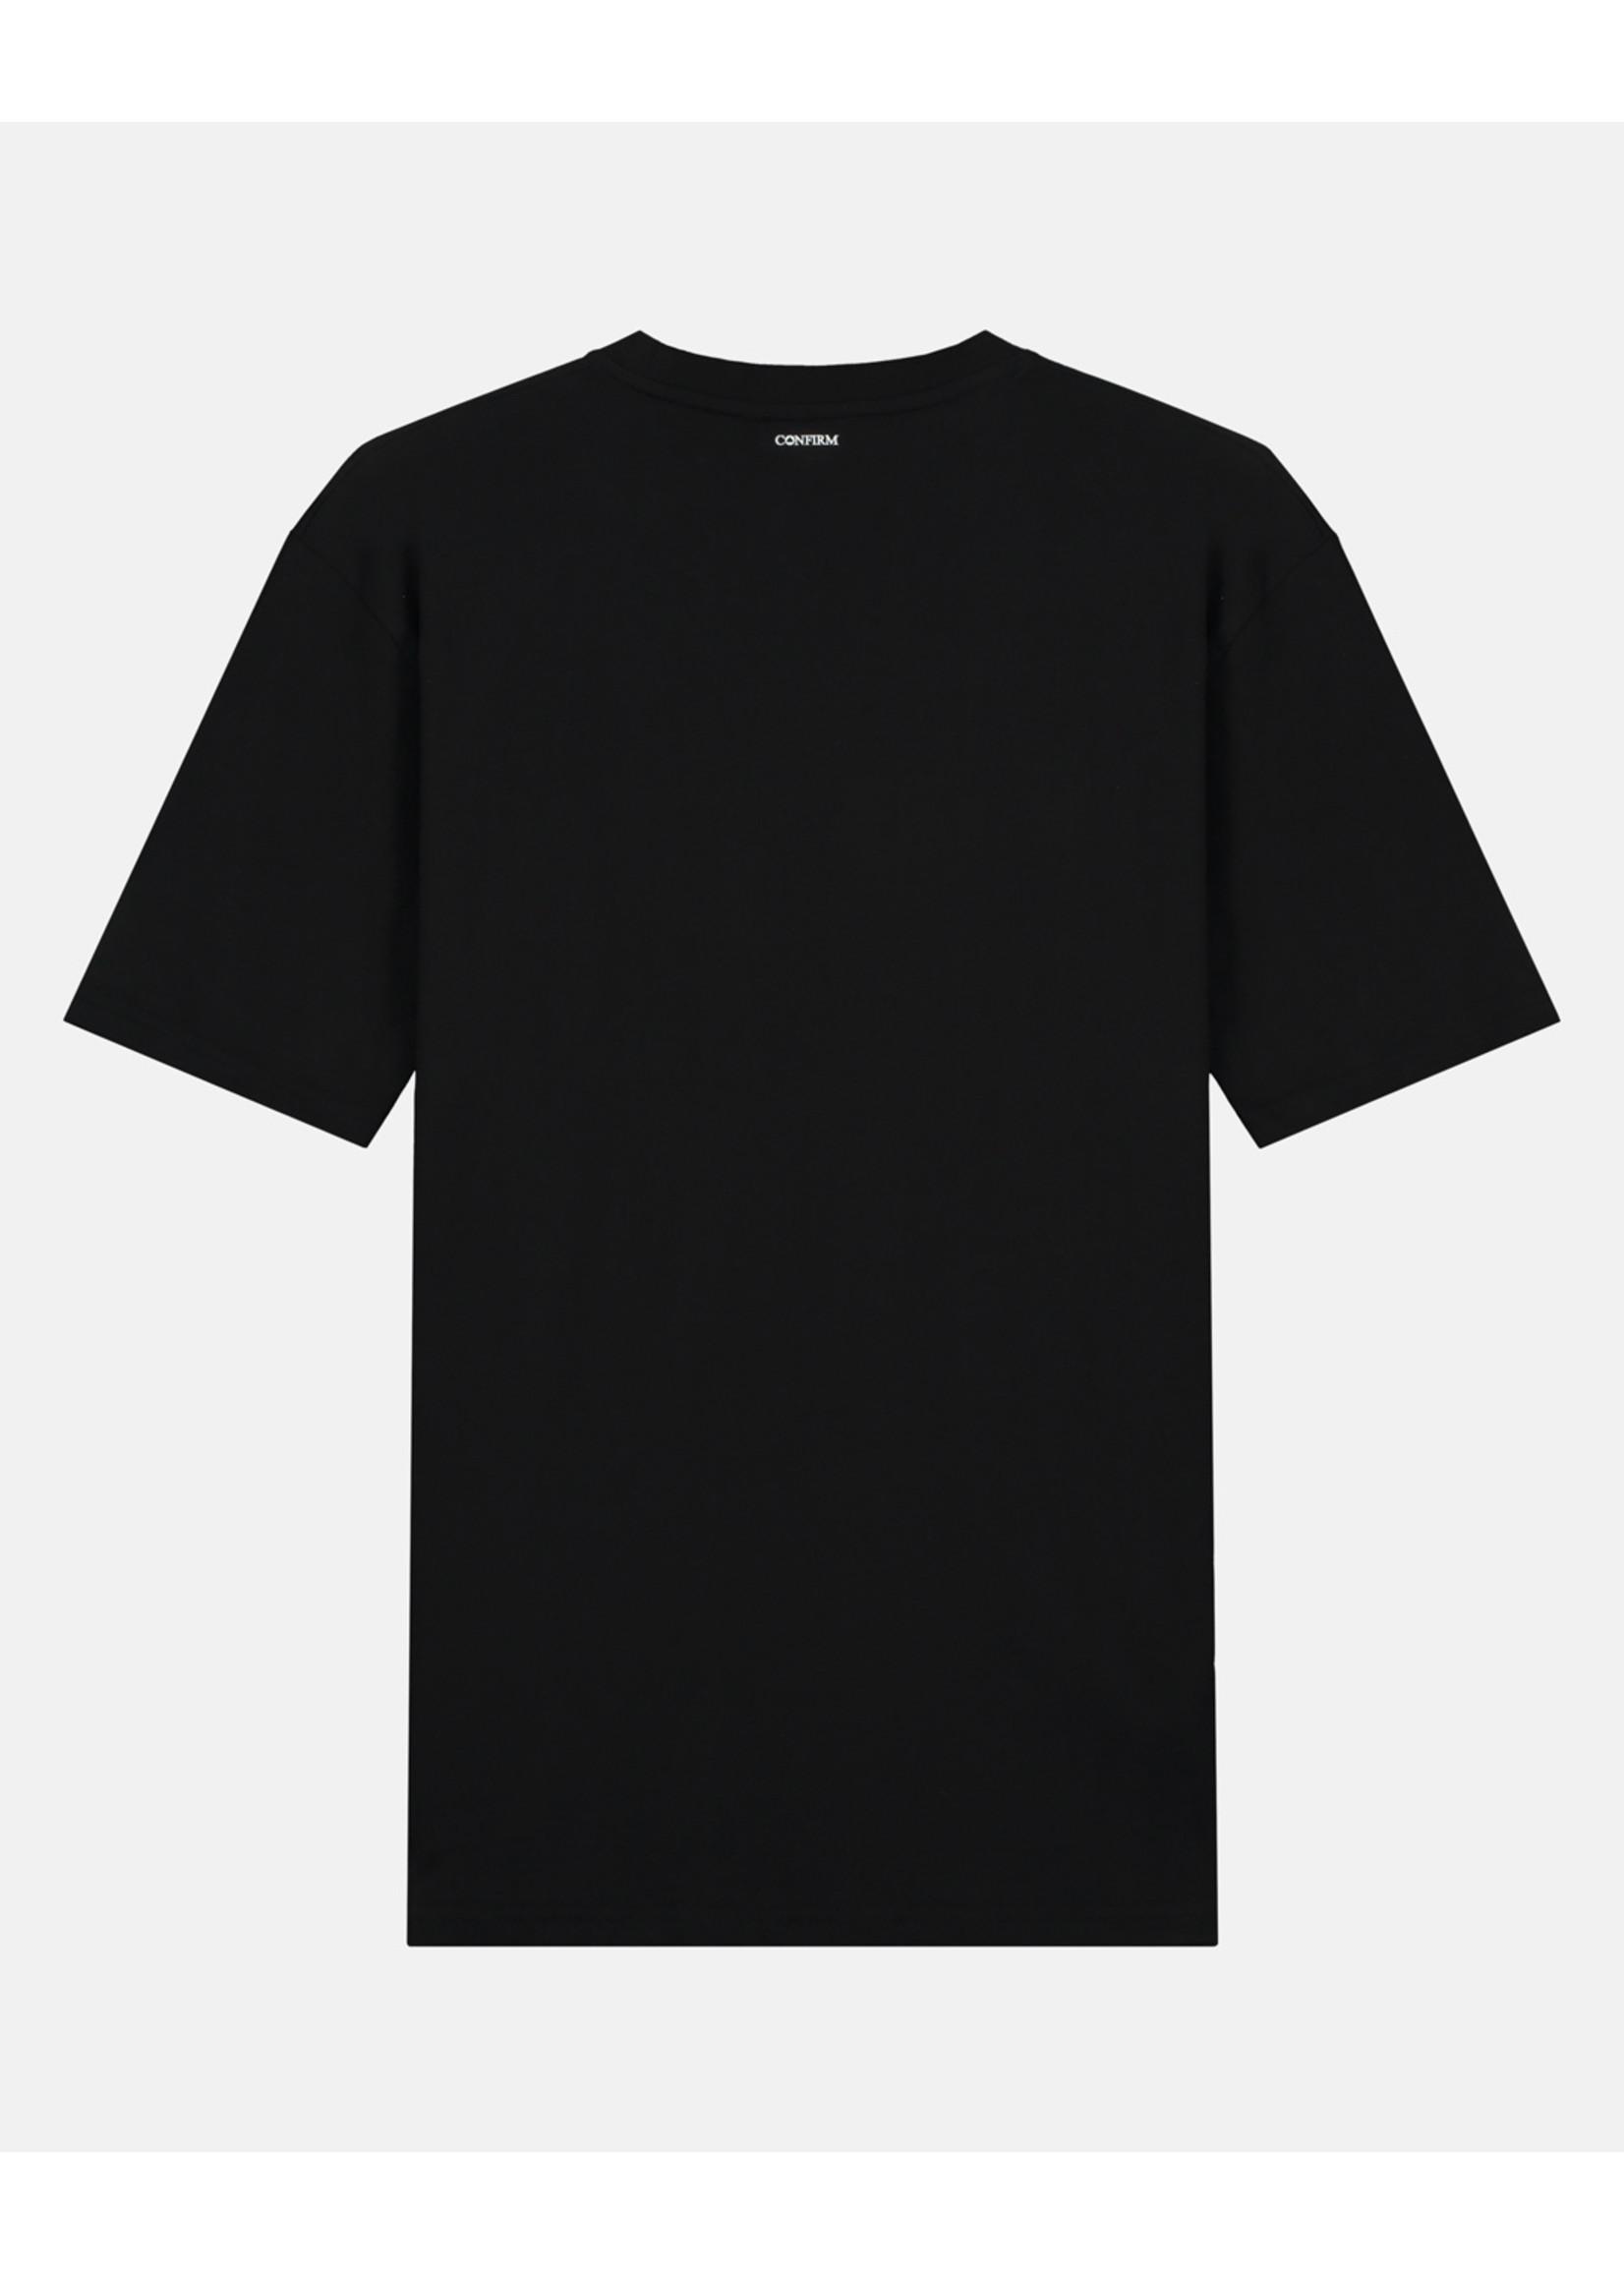 Confirm brand T-shirt identity subtle- neon oranje